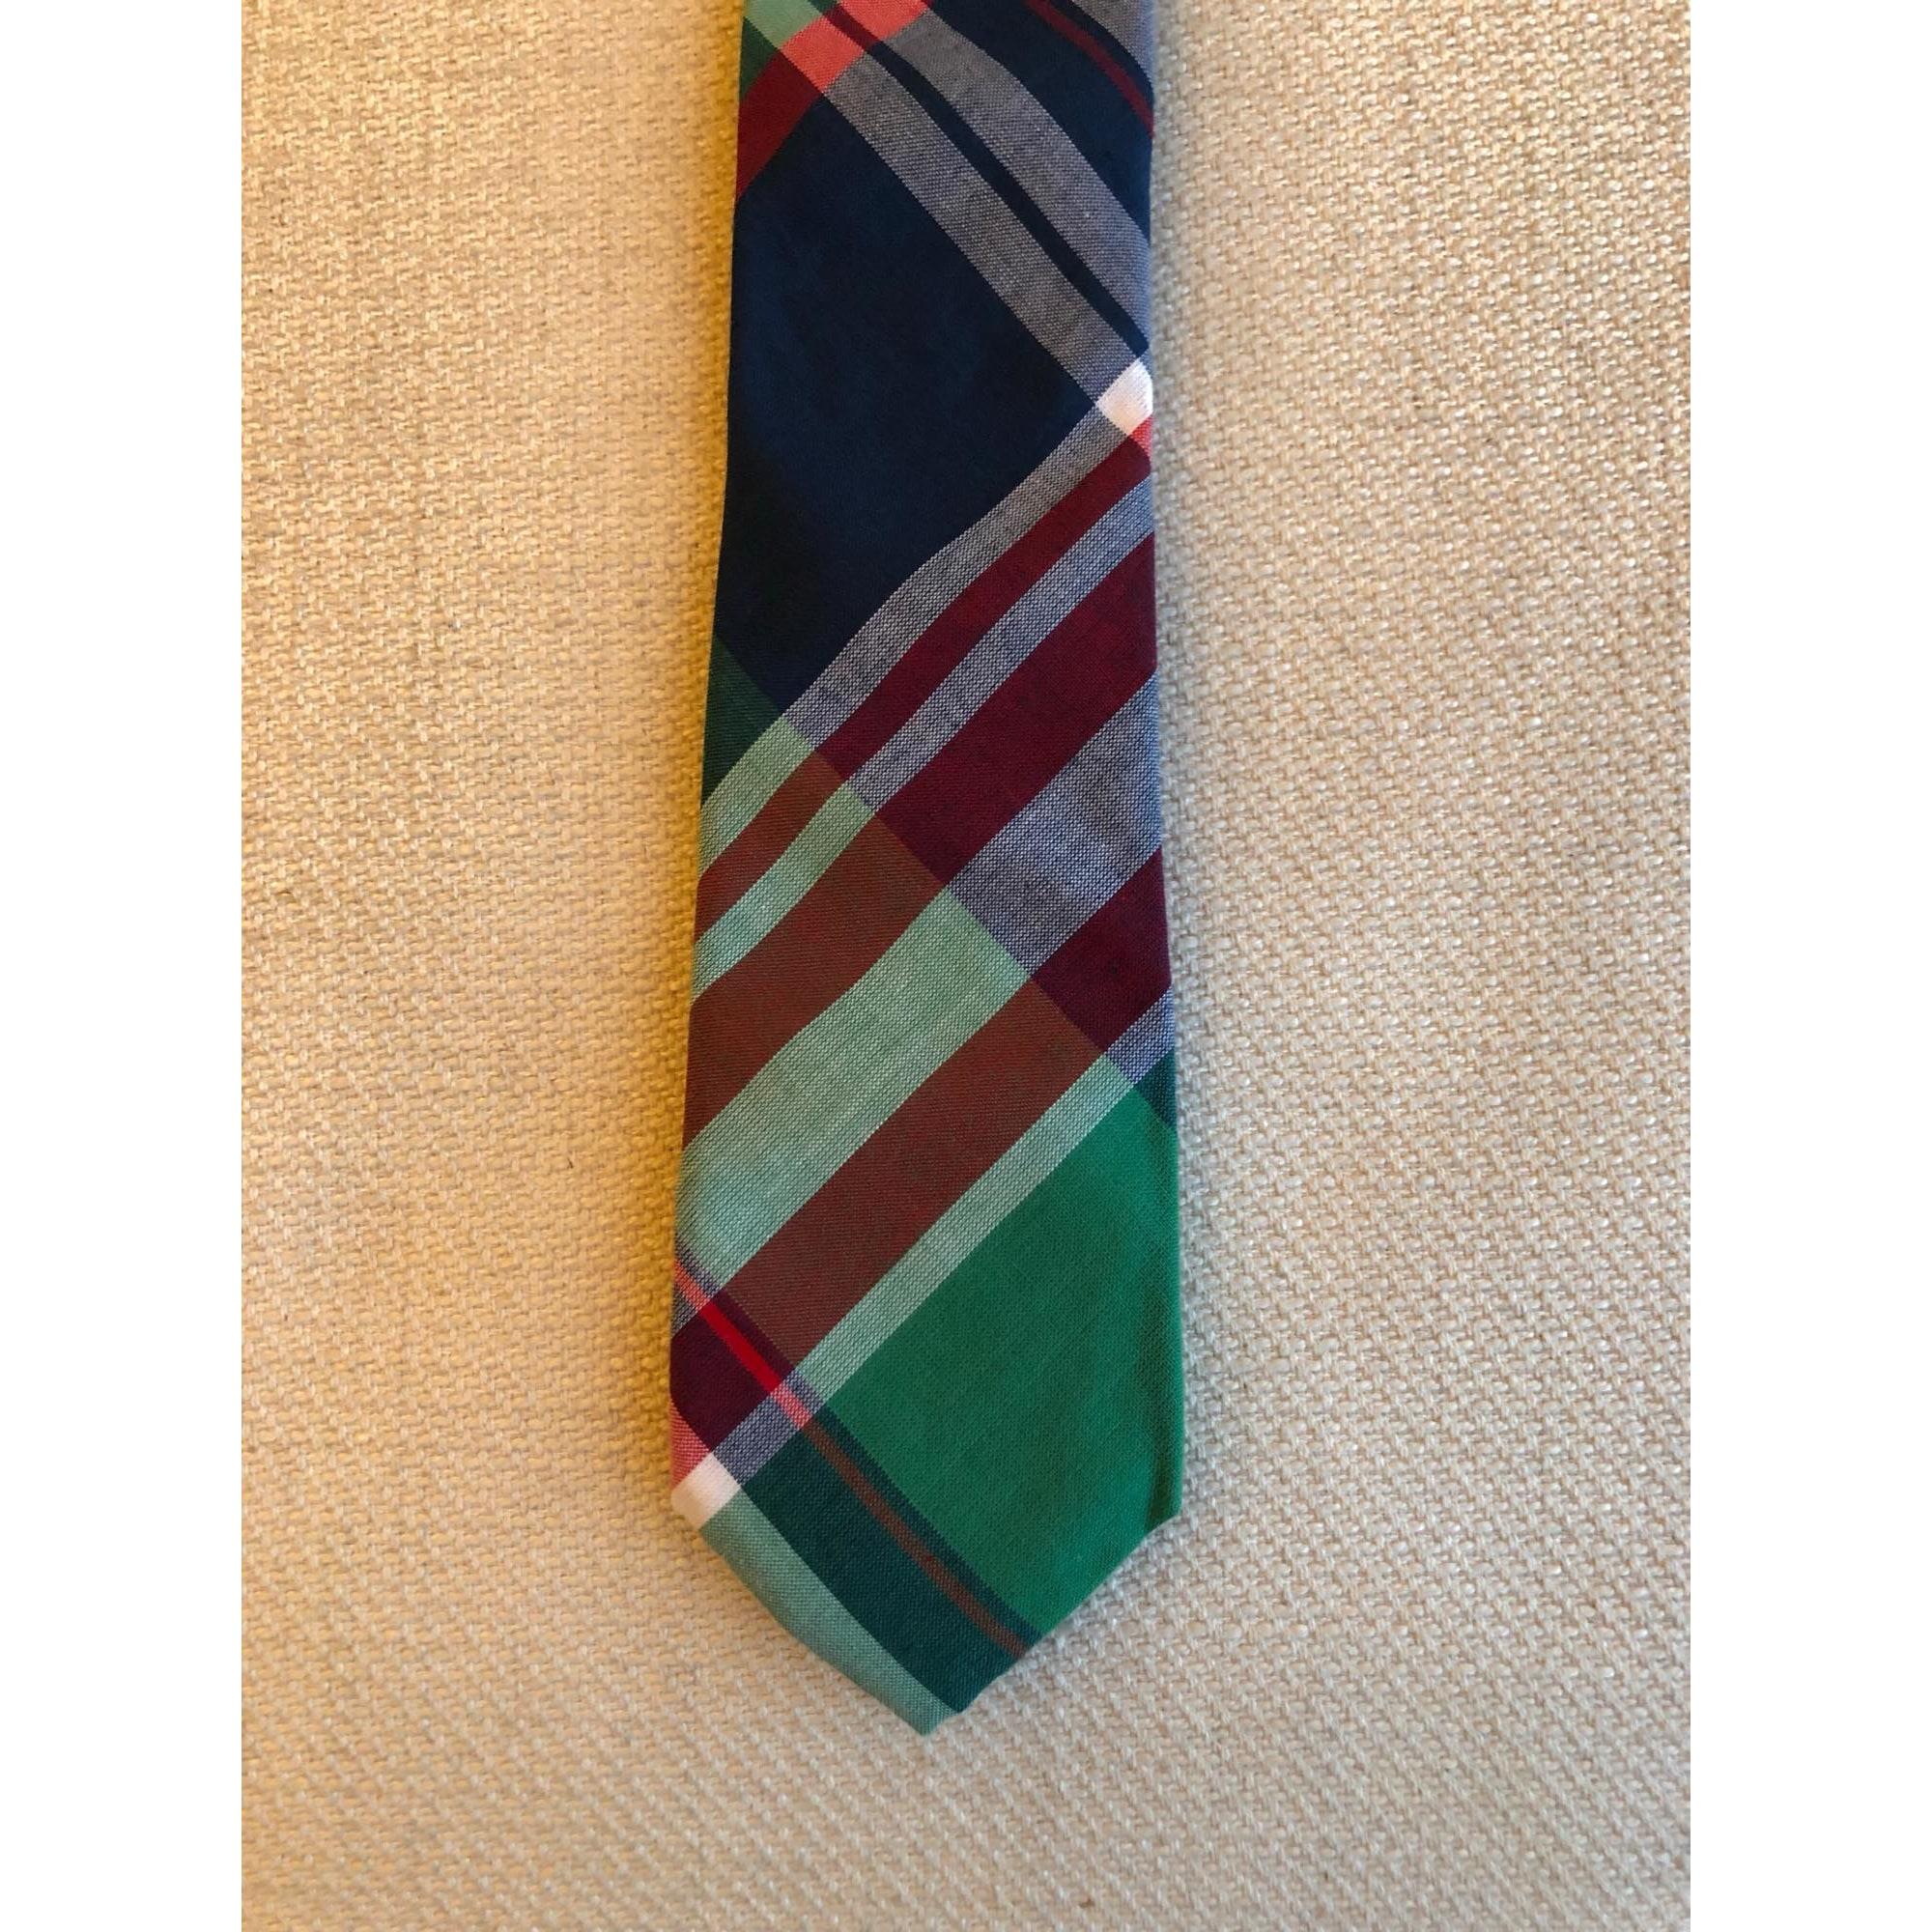 Cravate J CREW Vert